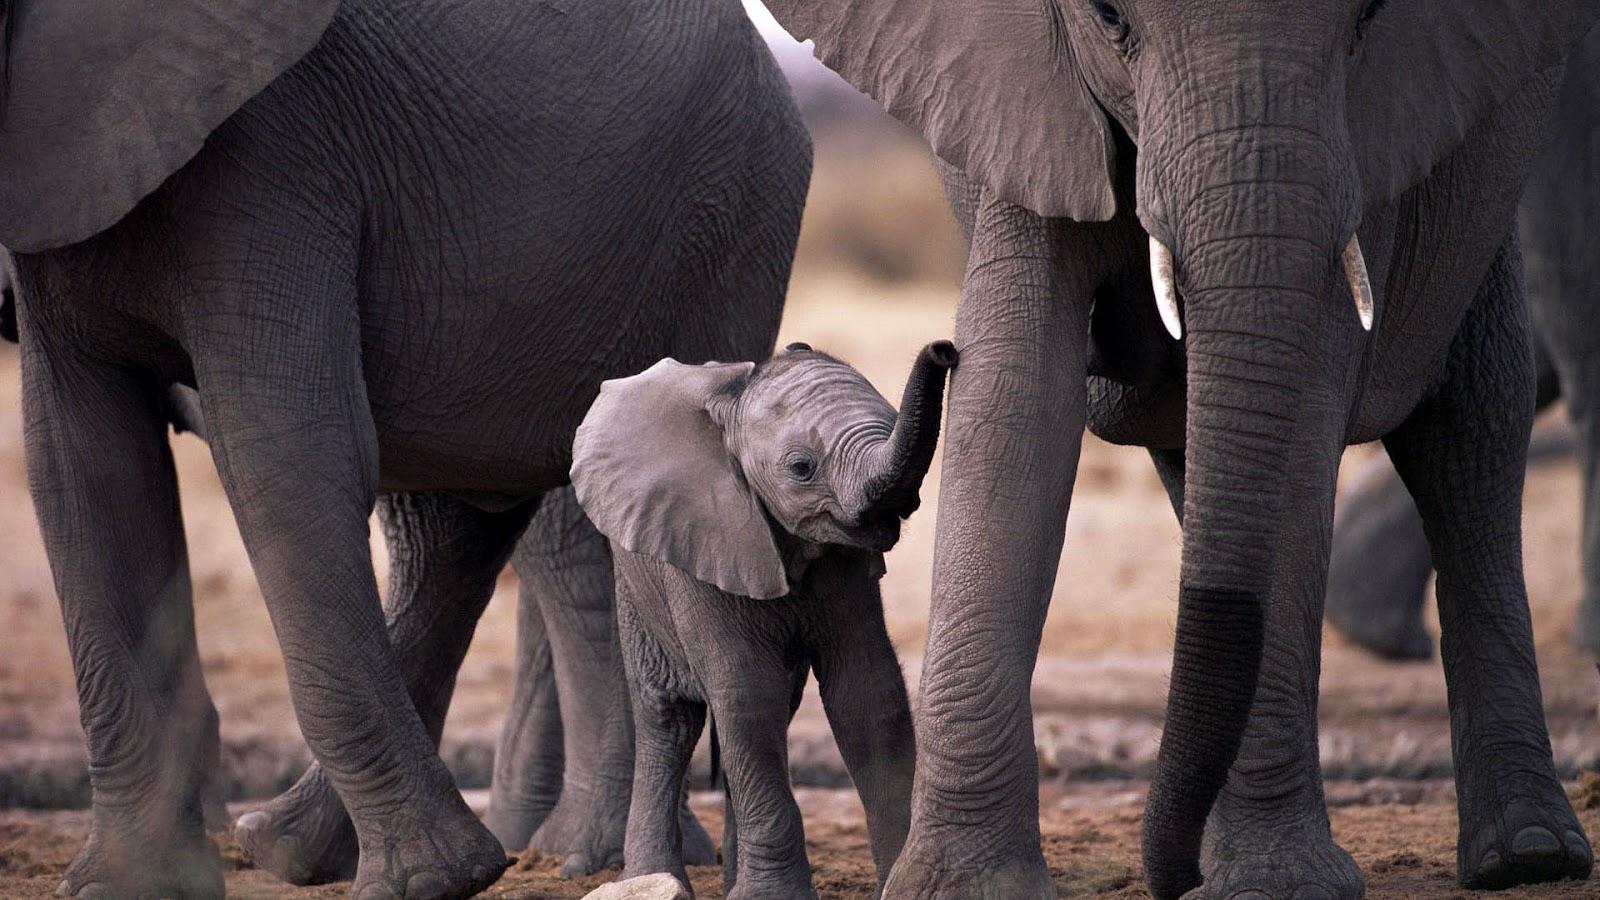 Baby Elephant Wallpaper - WallpaperSafari